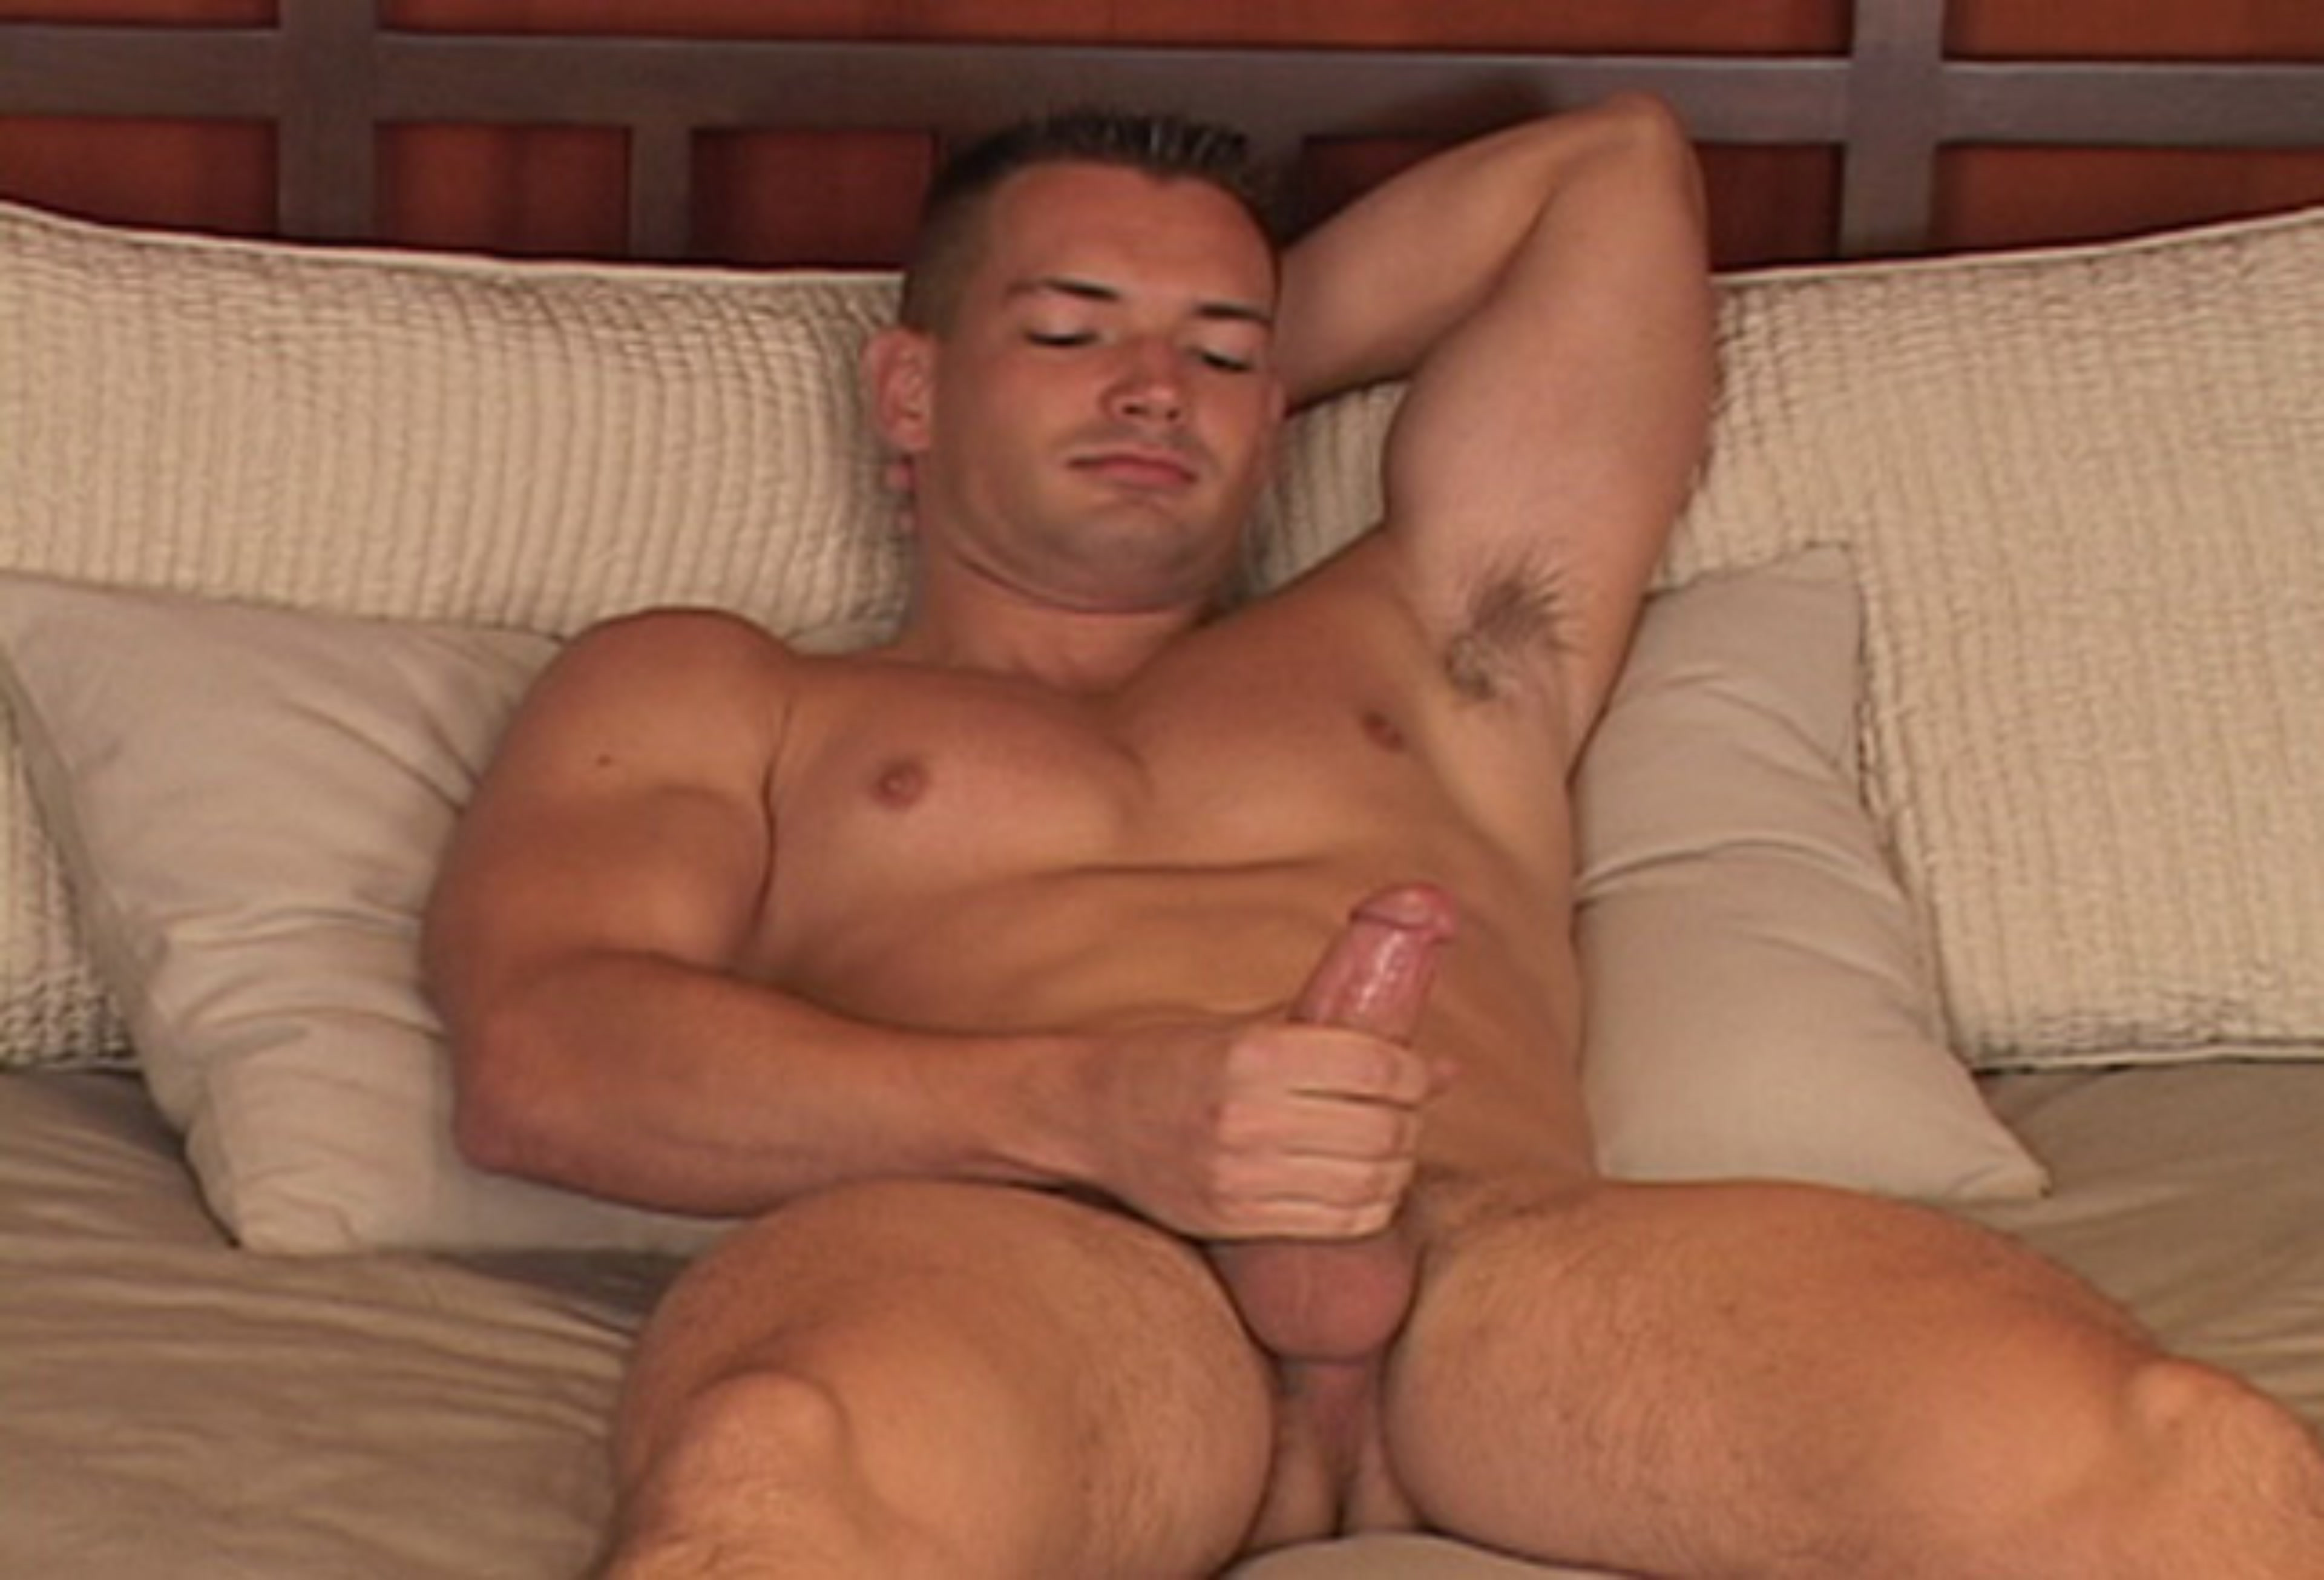 Adam Hardy Porn brody jock brody – x private club